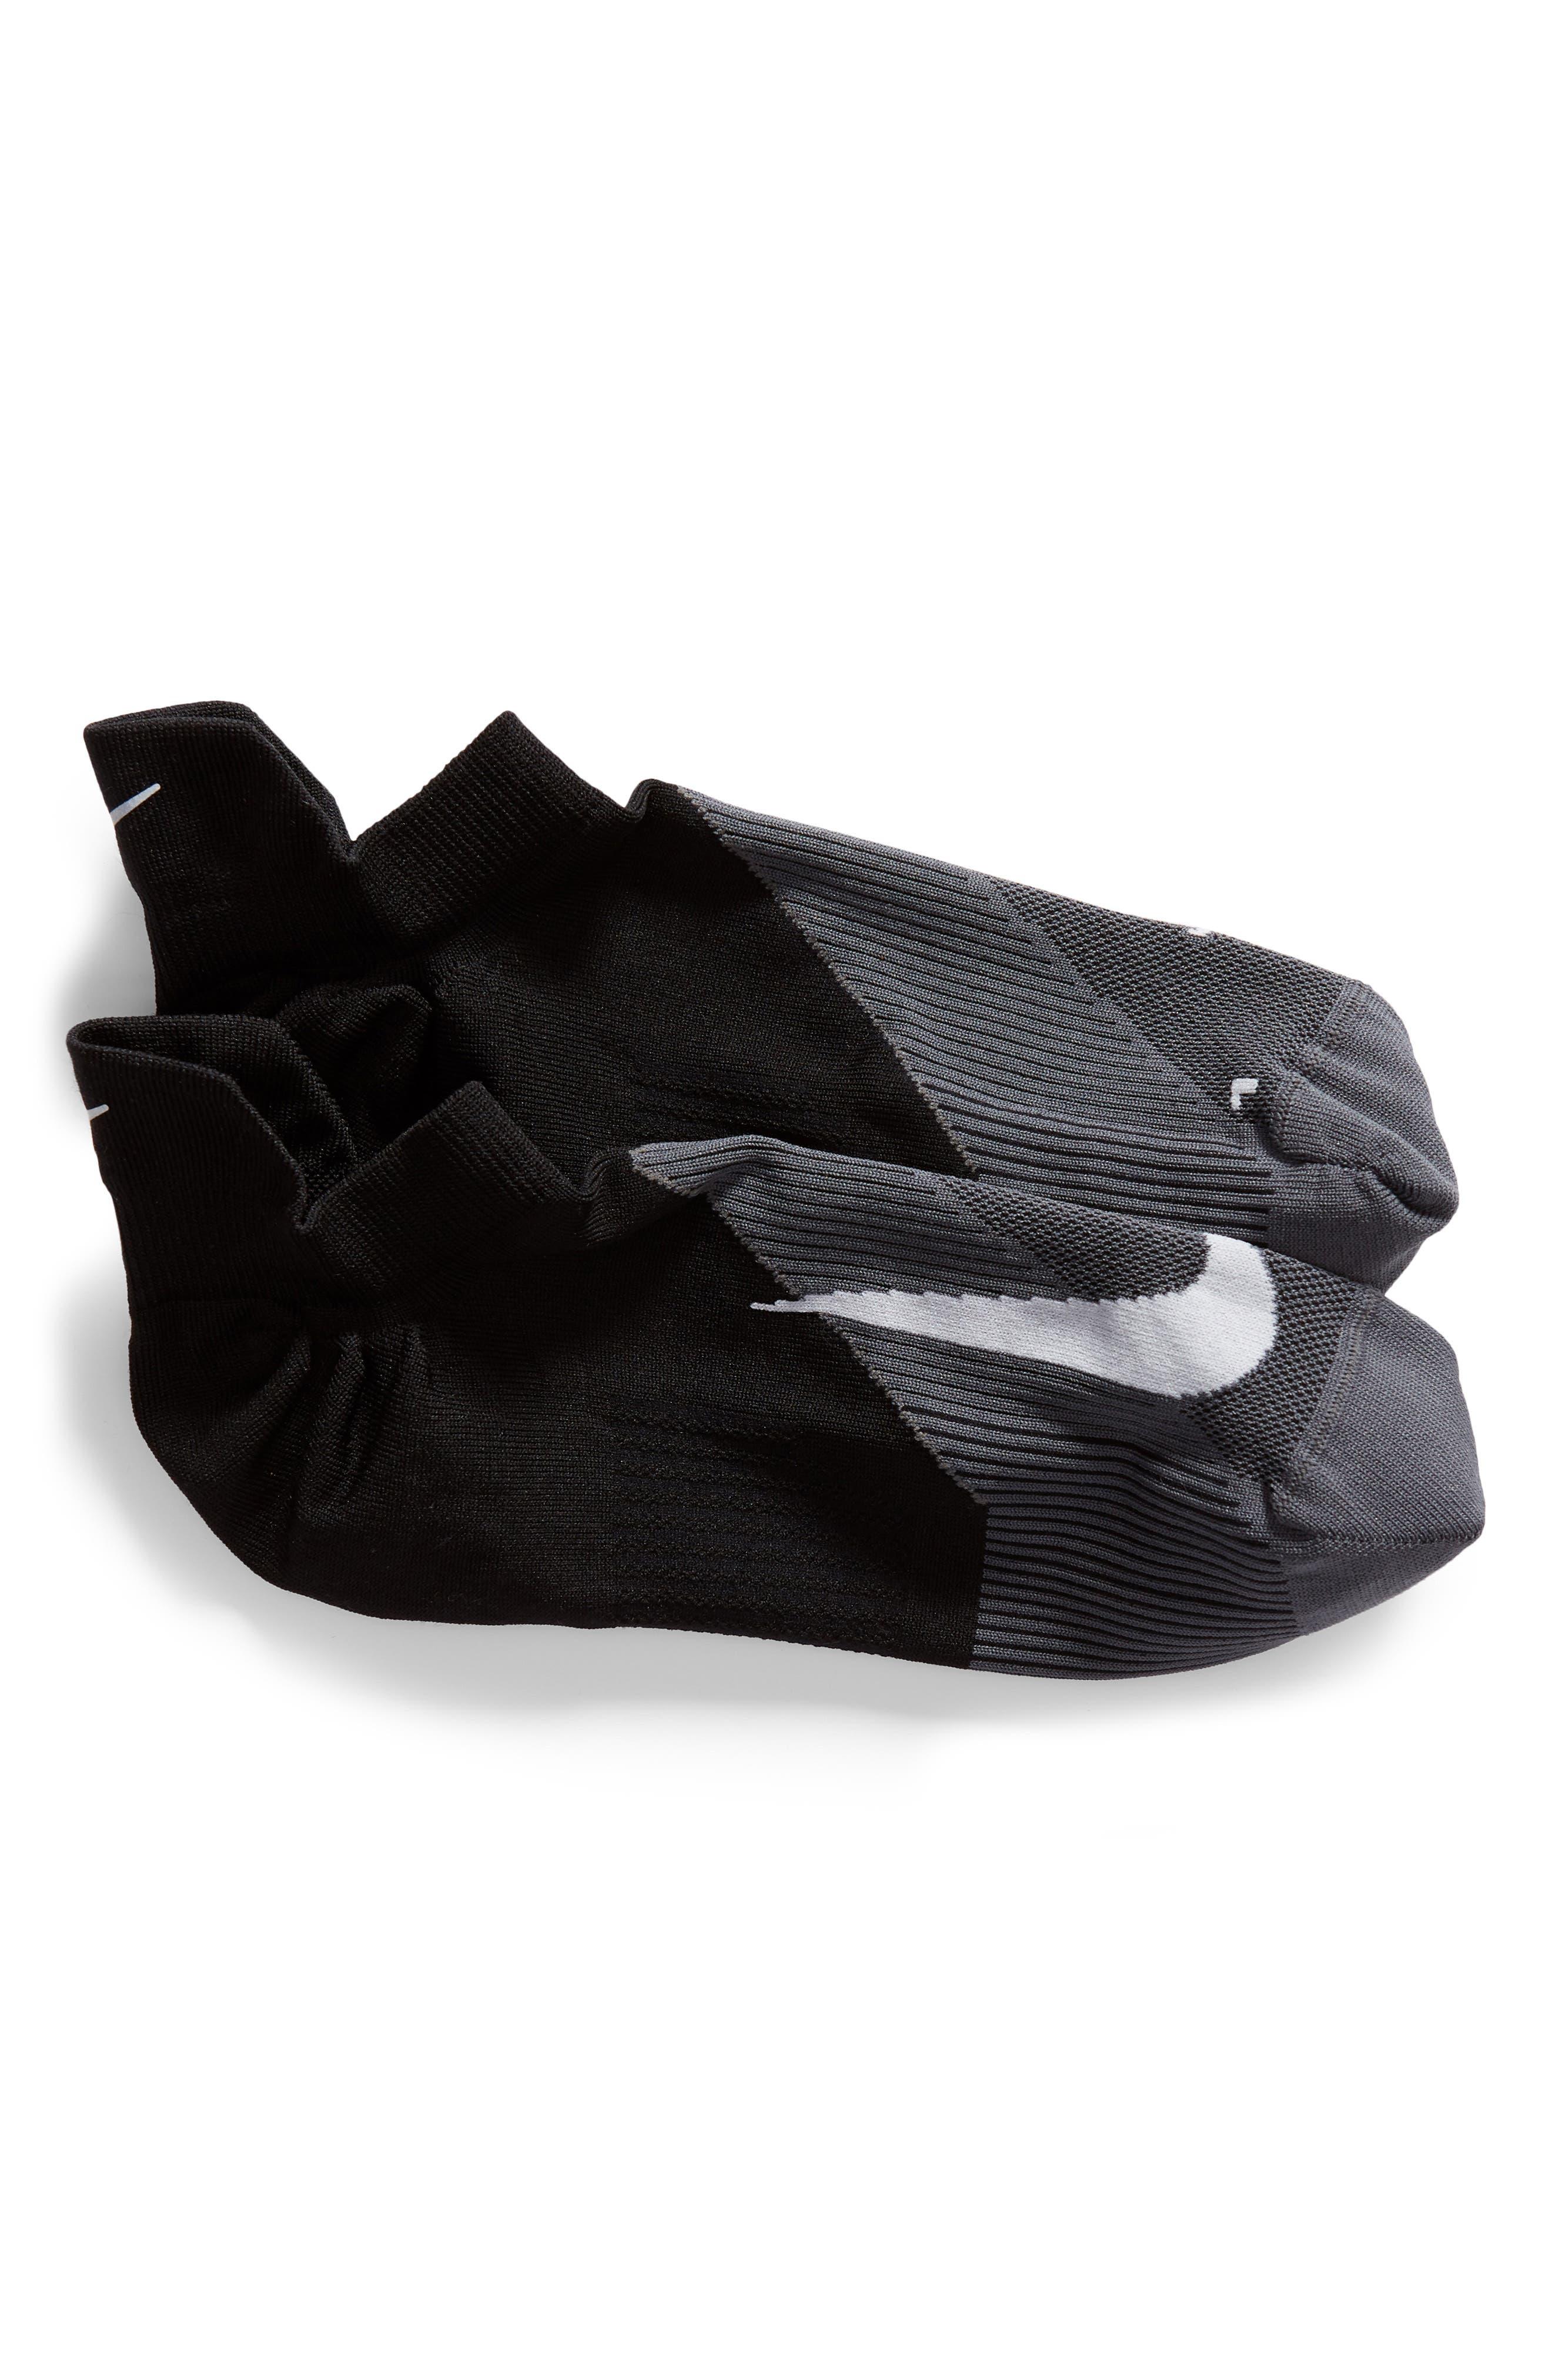 Elite Lightweight No-Show Socks,                         Main,                         color, BLACK/ WHITE